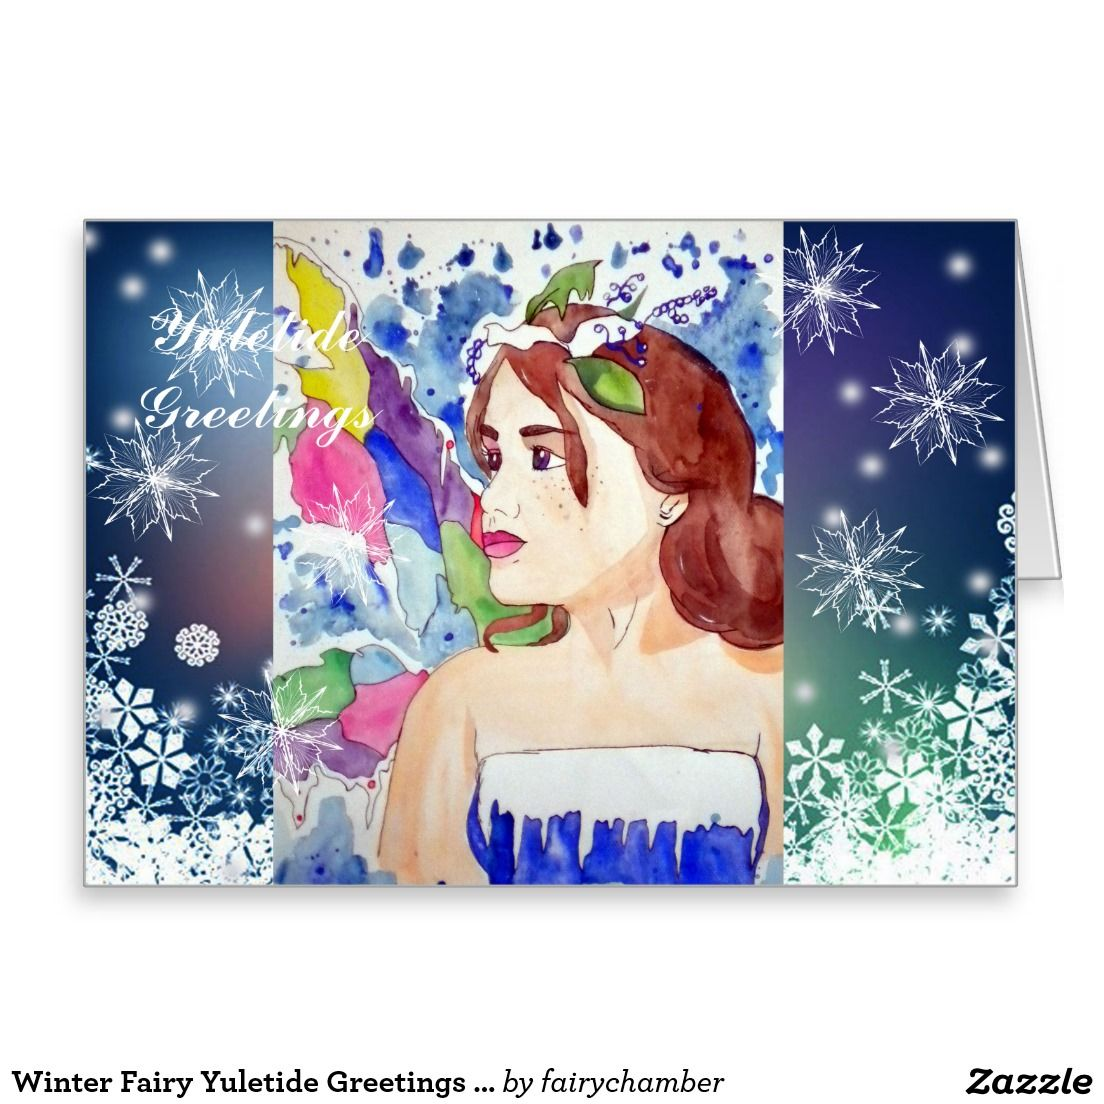 Winter fairy yuletide greetings greeting card cool art winter fairy yuletide greetings greeting card kristyandbryce Choice Image